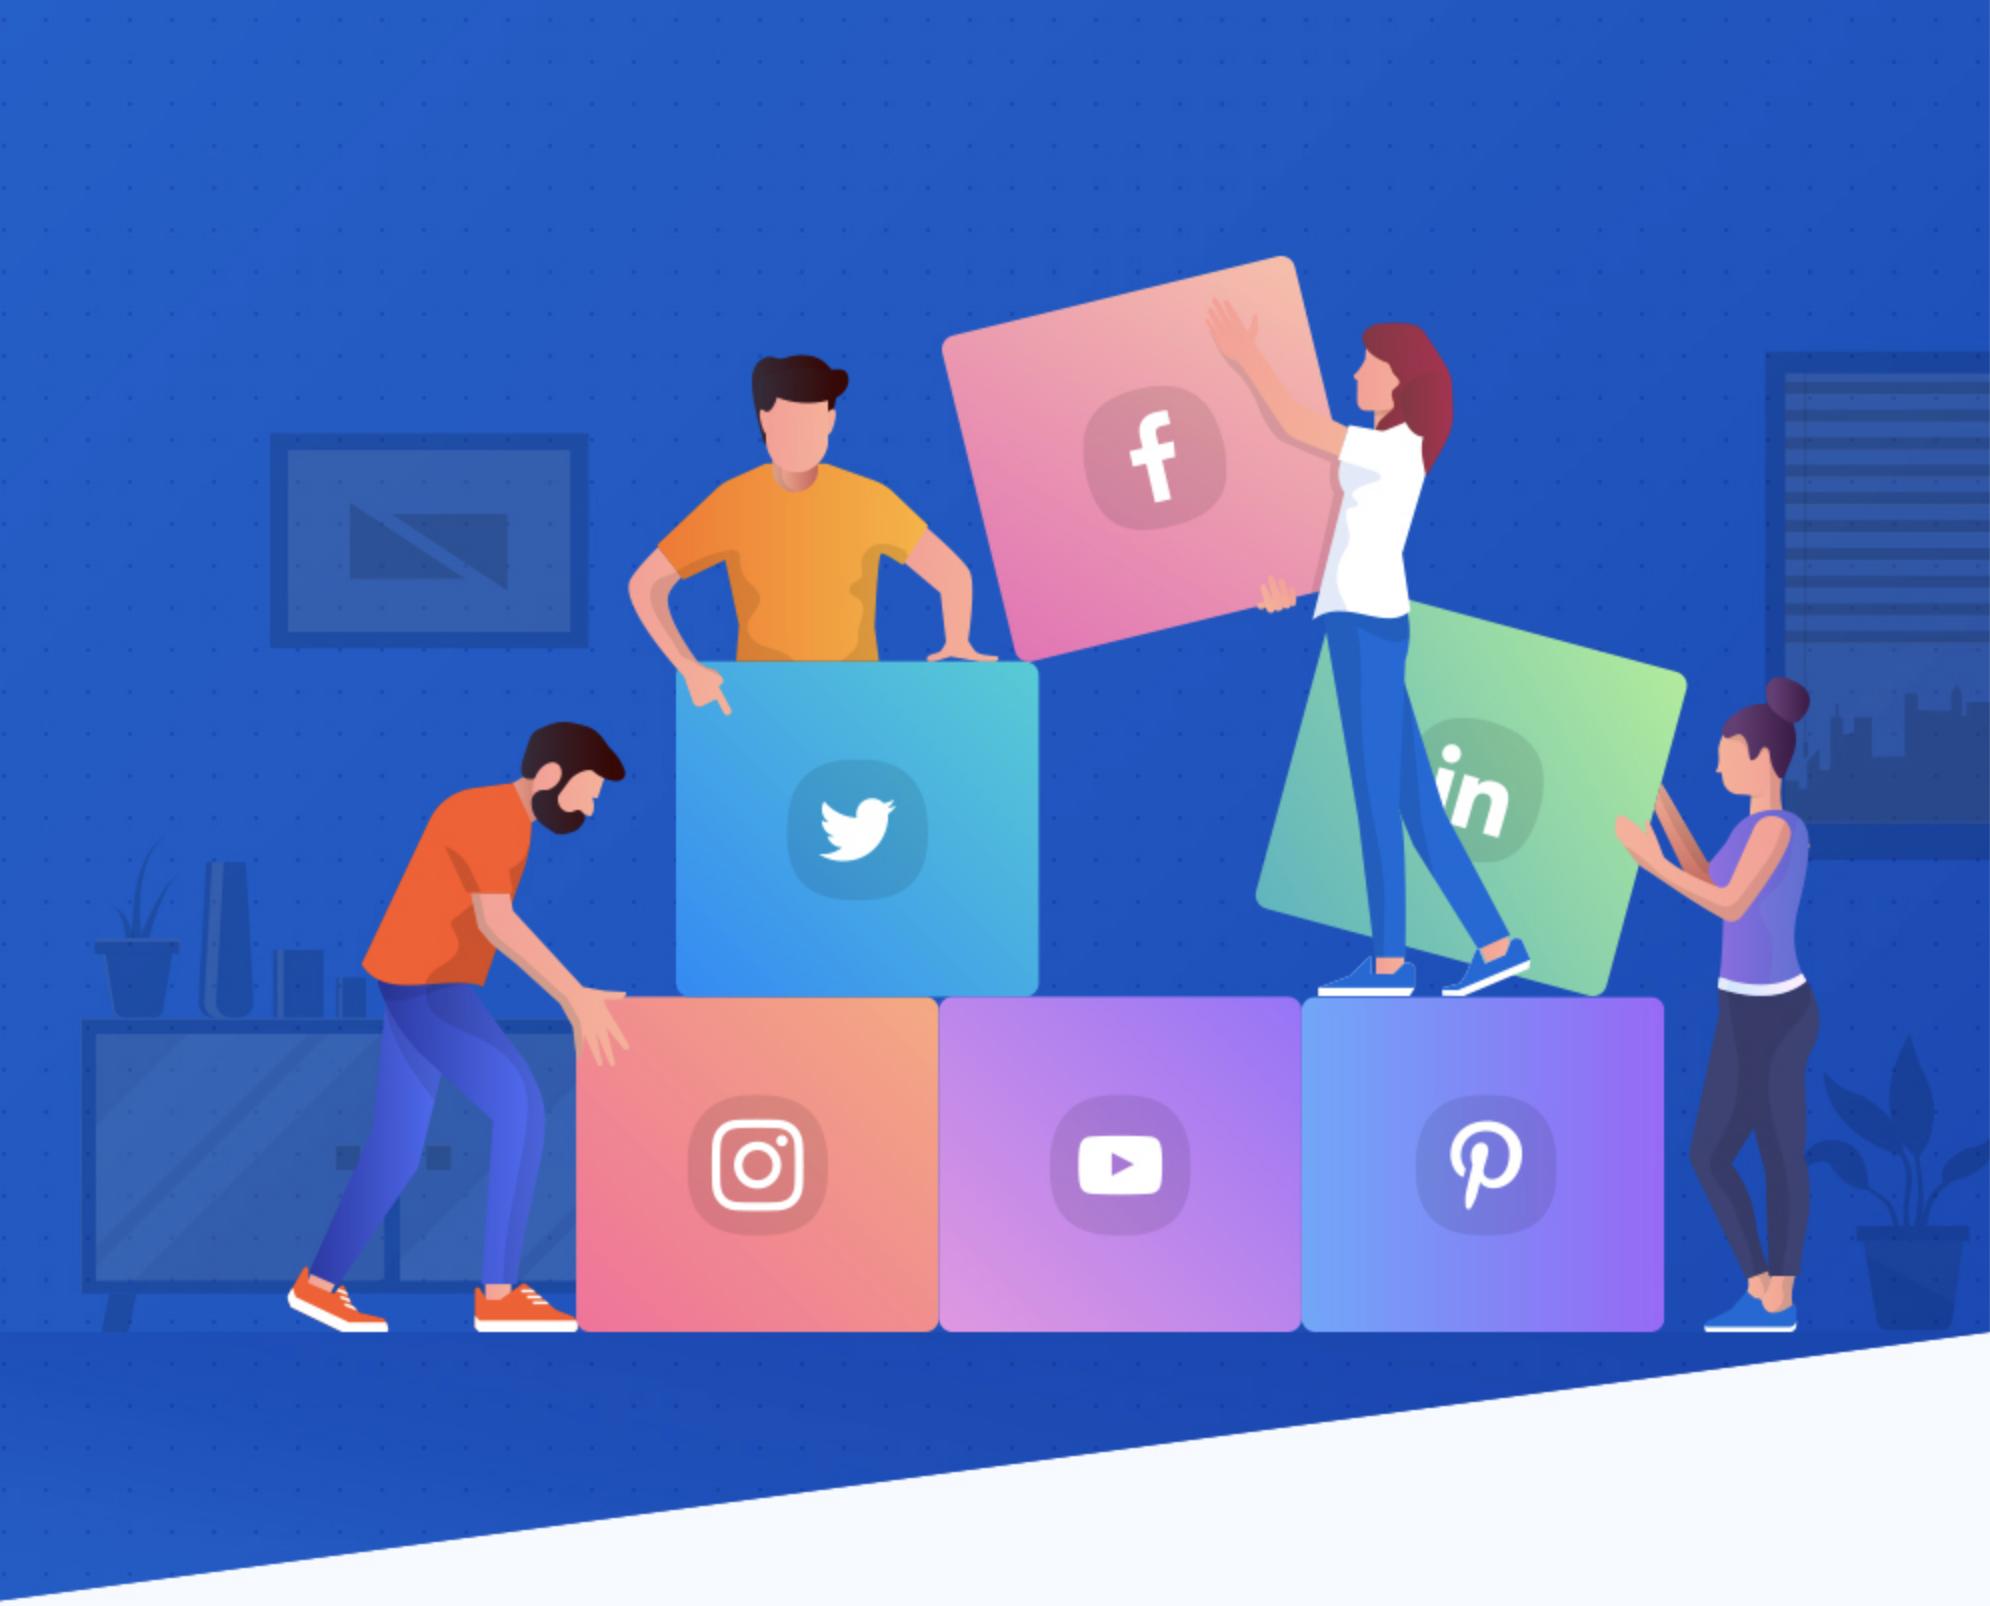 Social metwrok team artwork